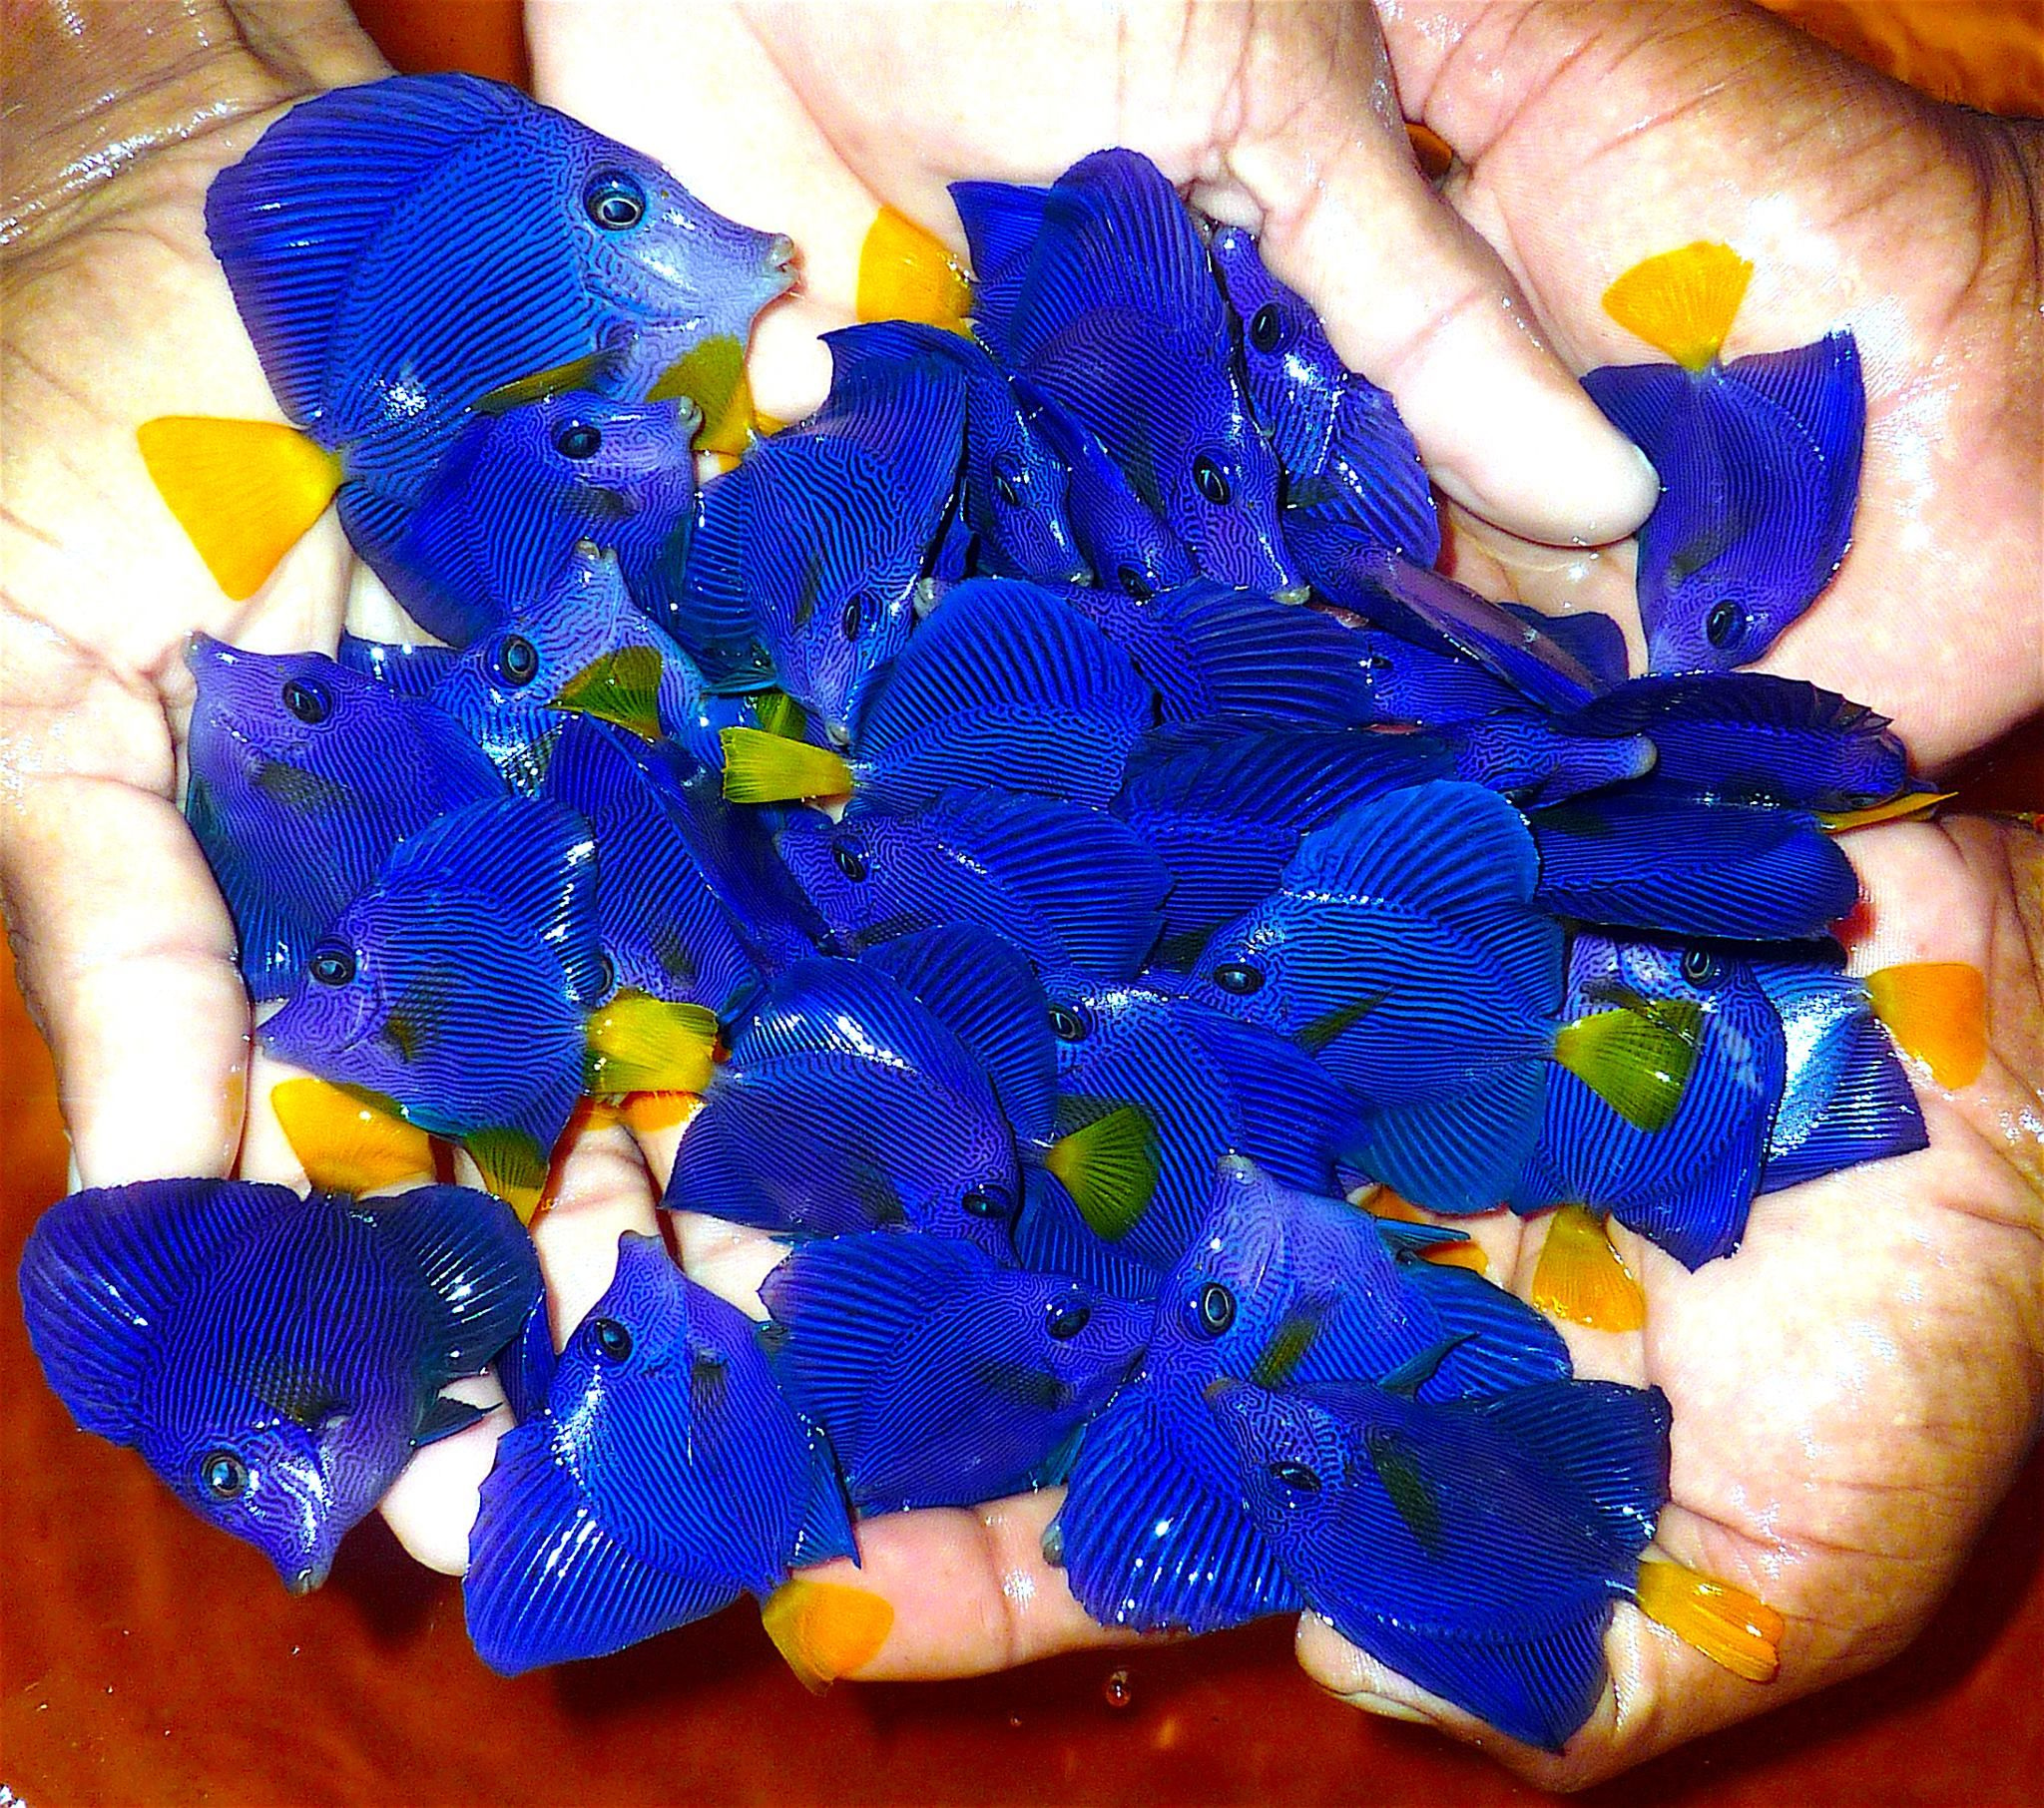 Aquarium fish tank sri lanka -  Tank Raised Purple Tangs Coming Soon From Sri Lanka Featured Surgeonfish Reef Builders